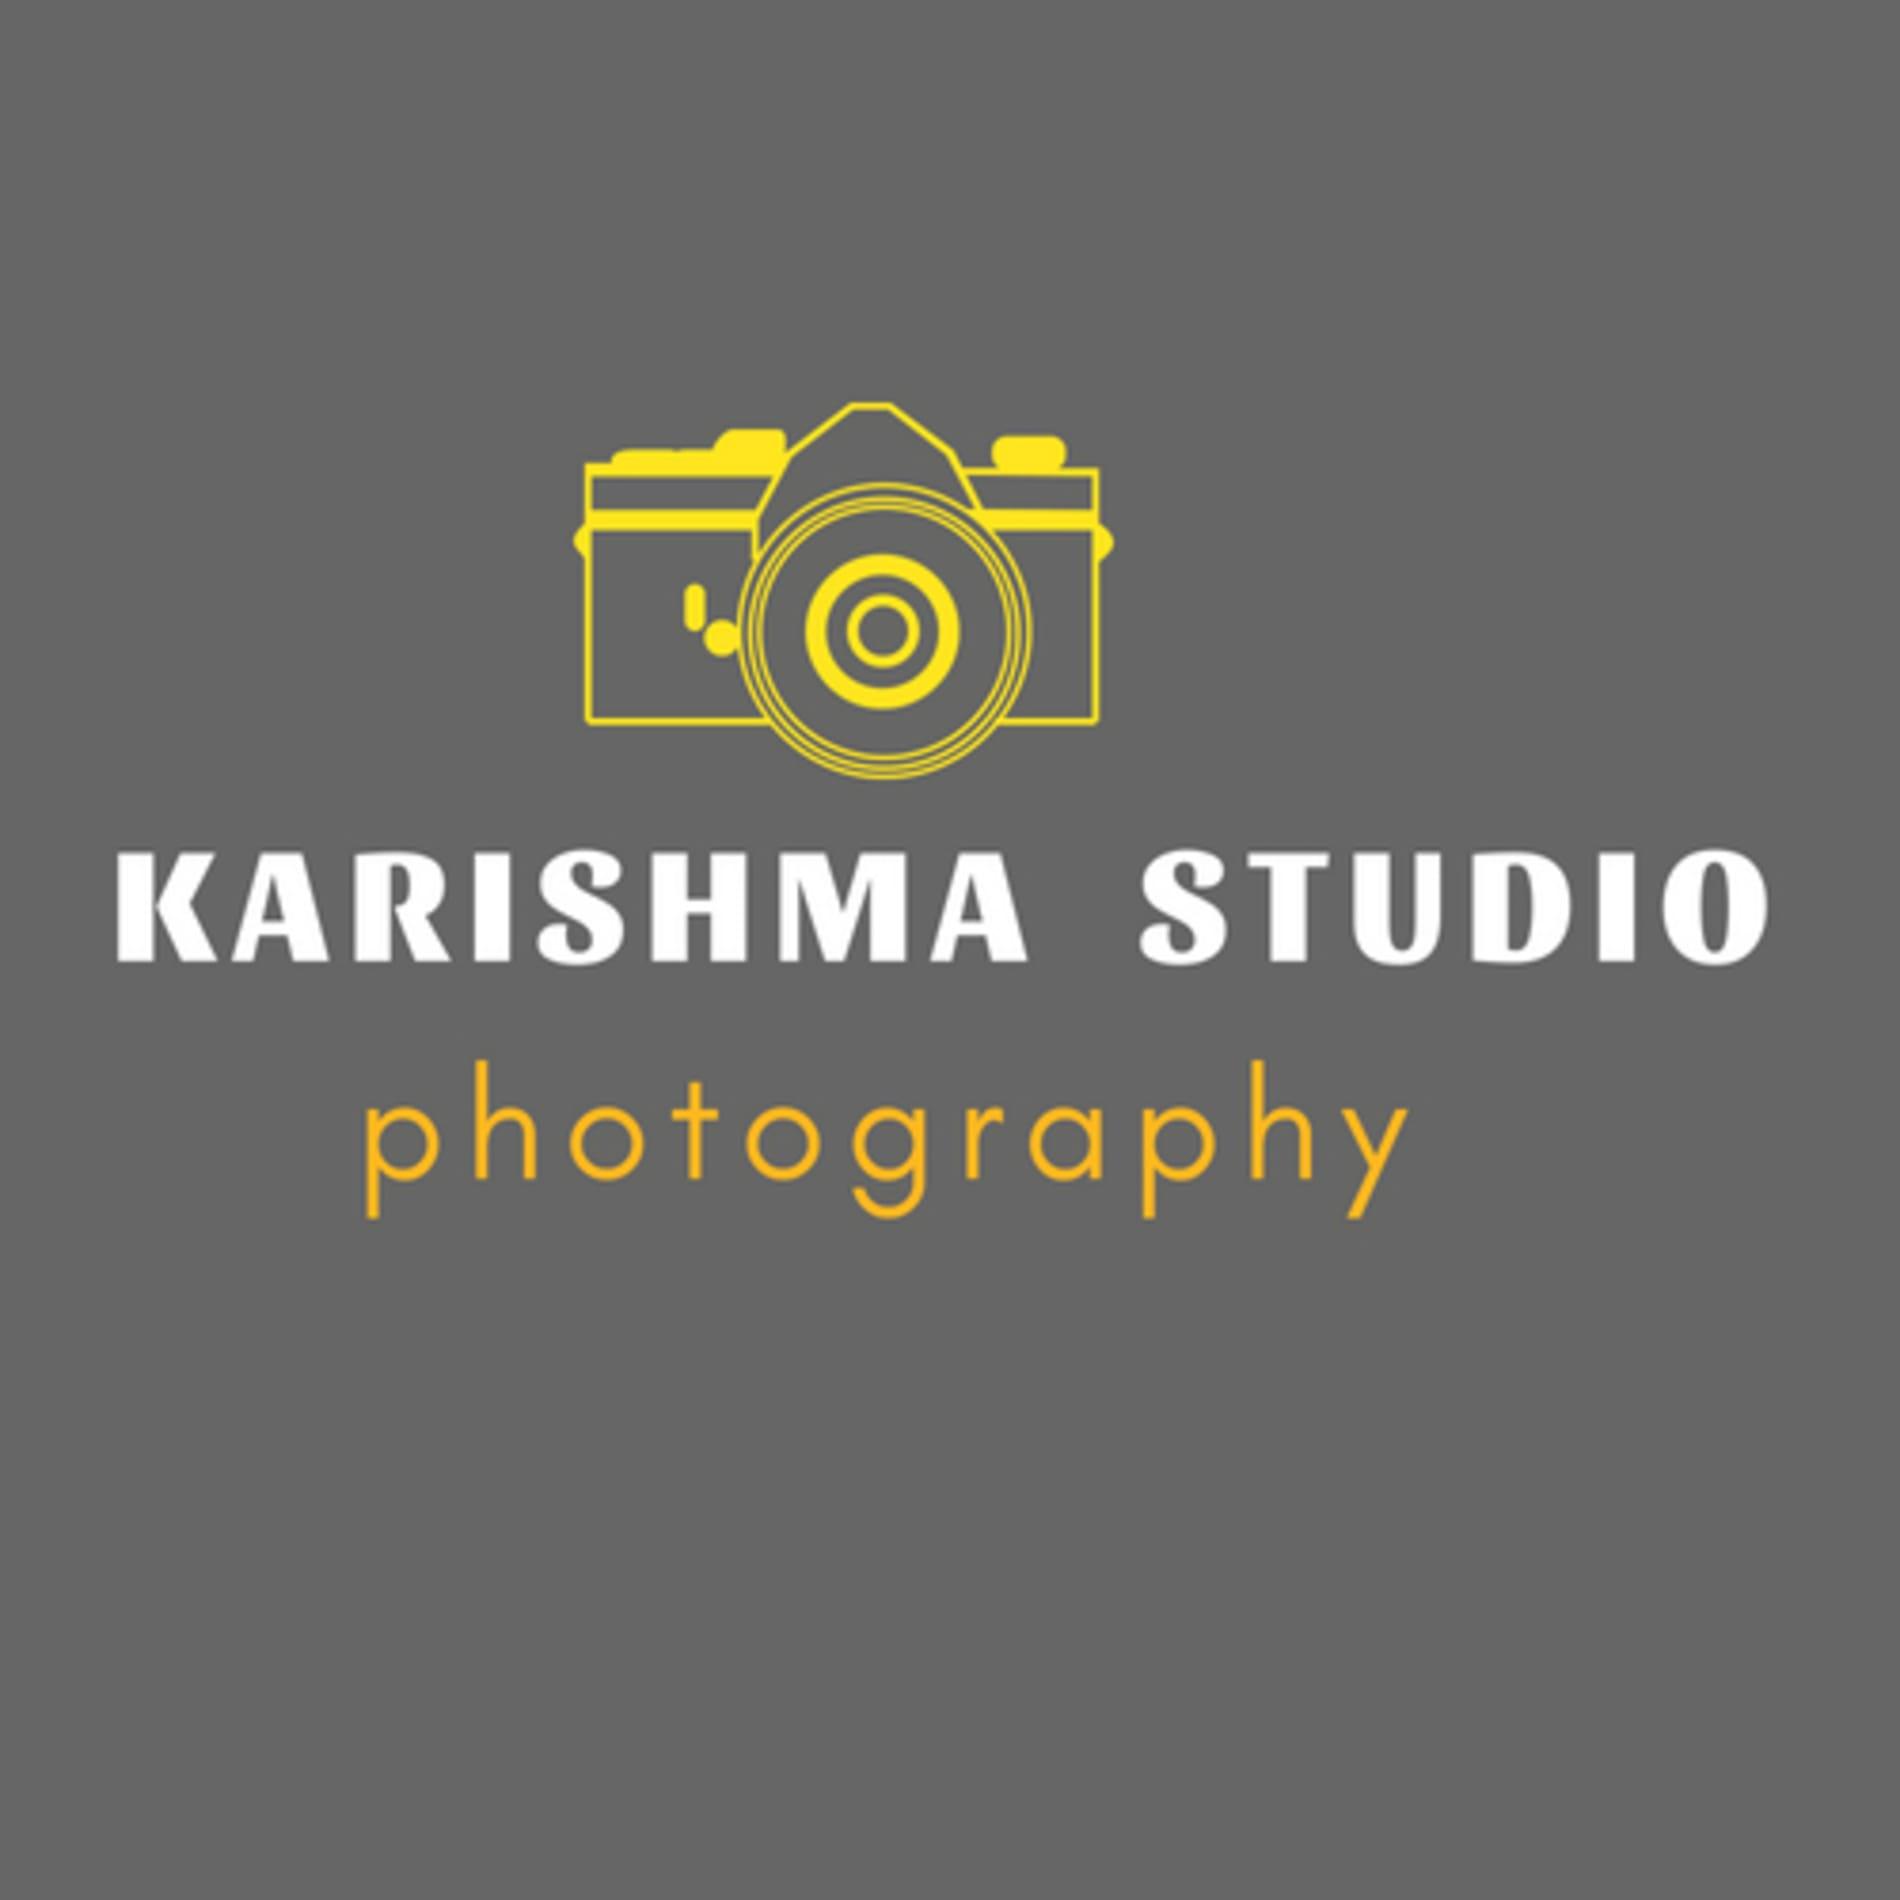 Karishma Studio